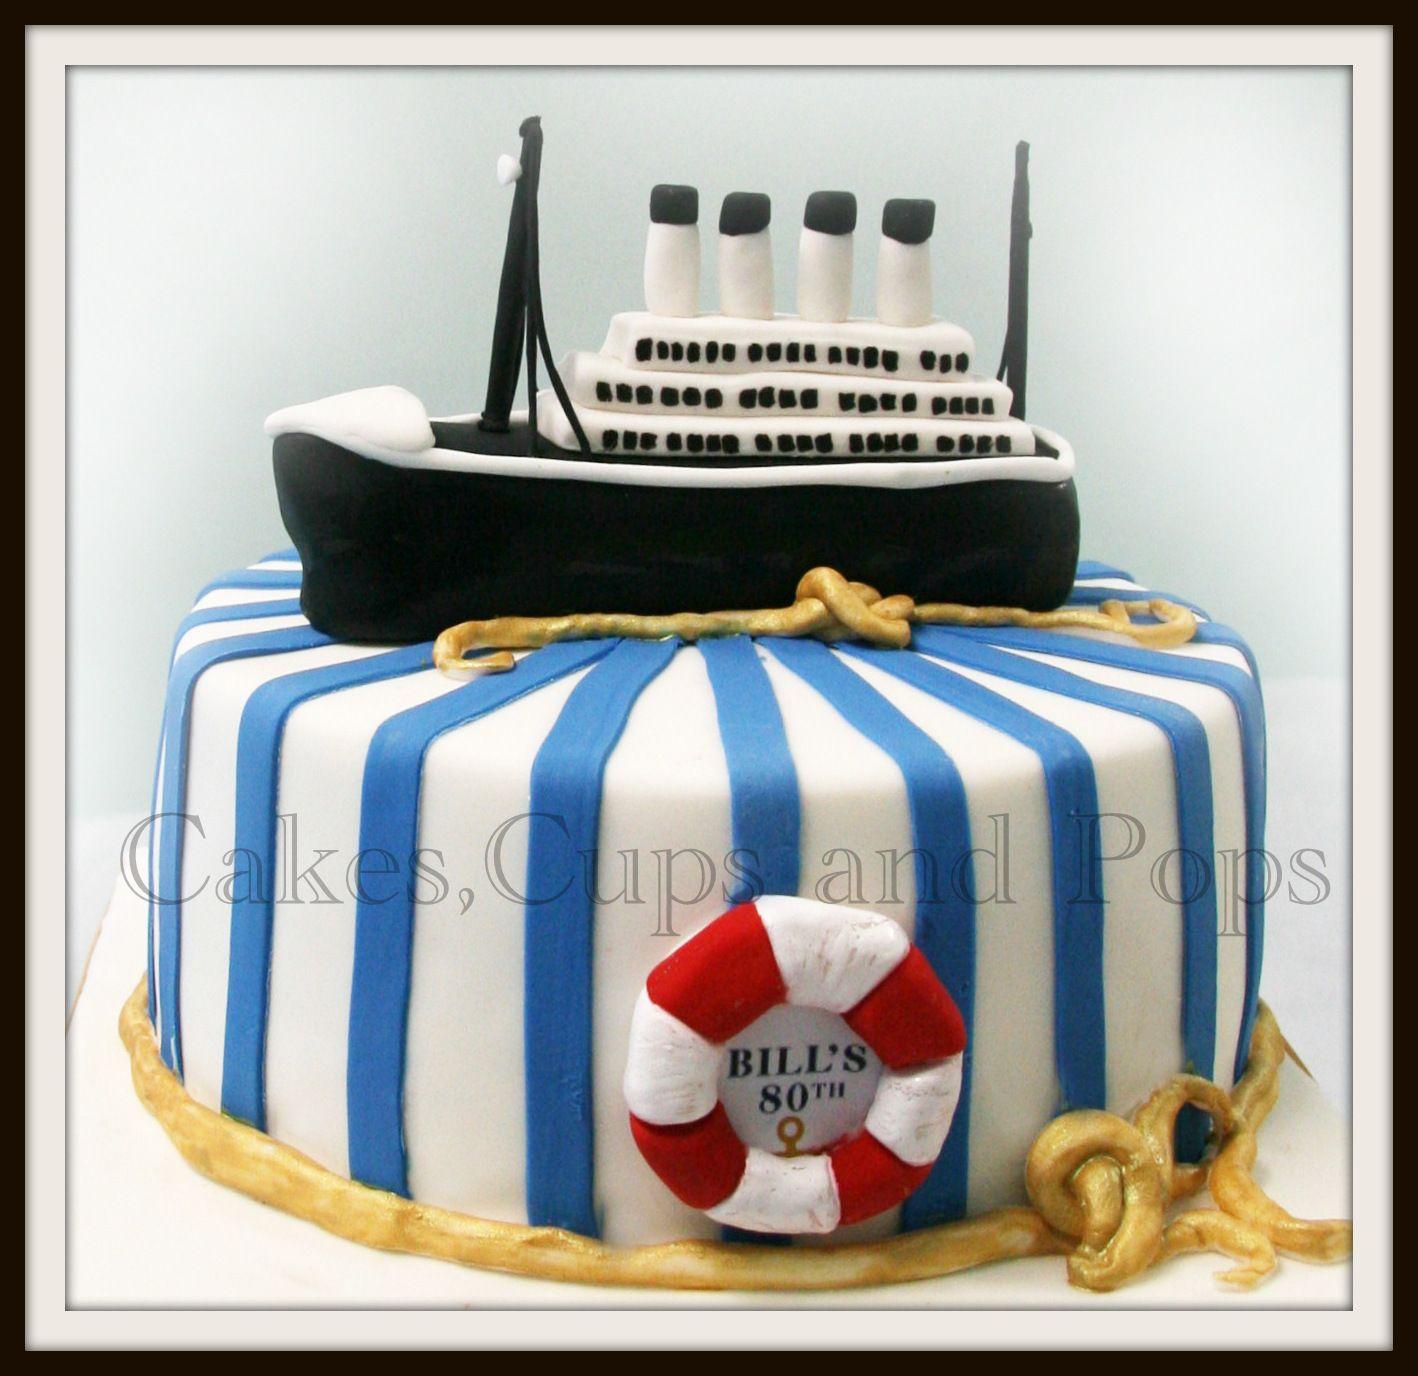 Titanic White Chocolate Mud 100 Cake And Topper